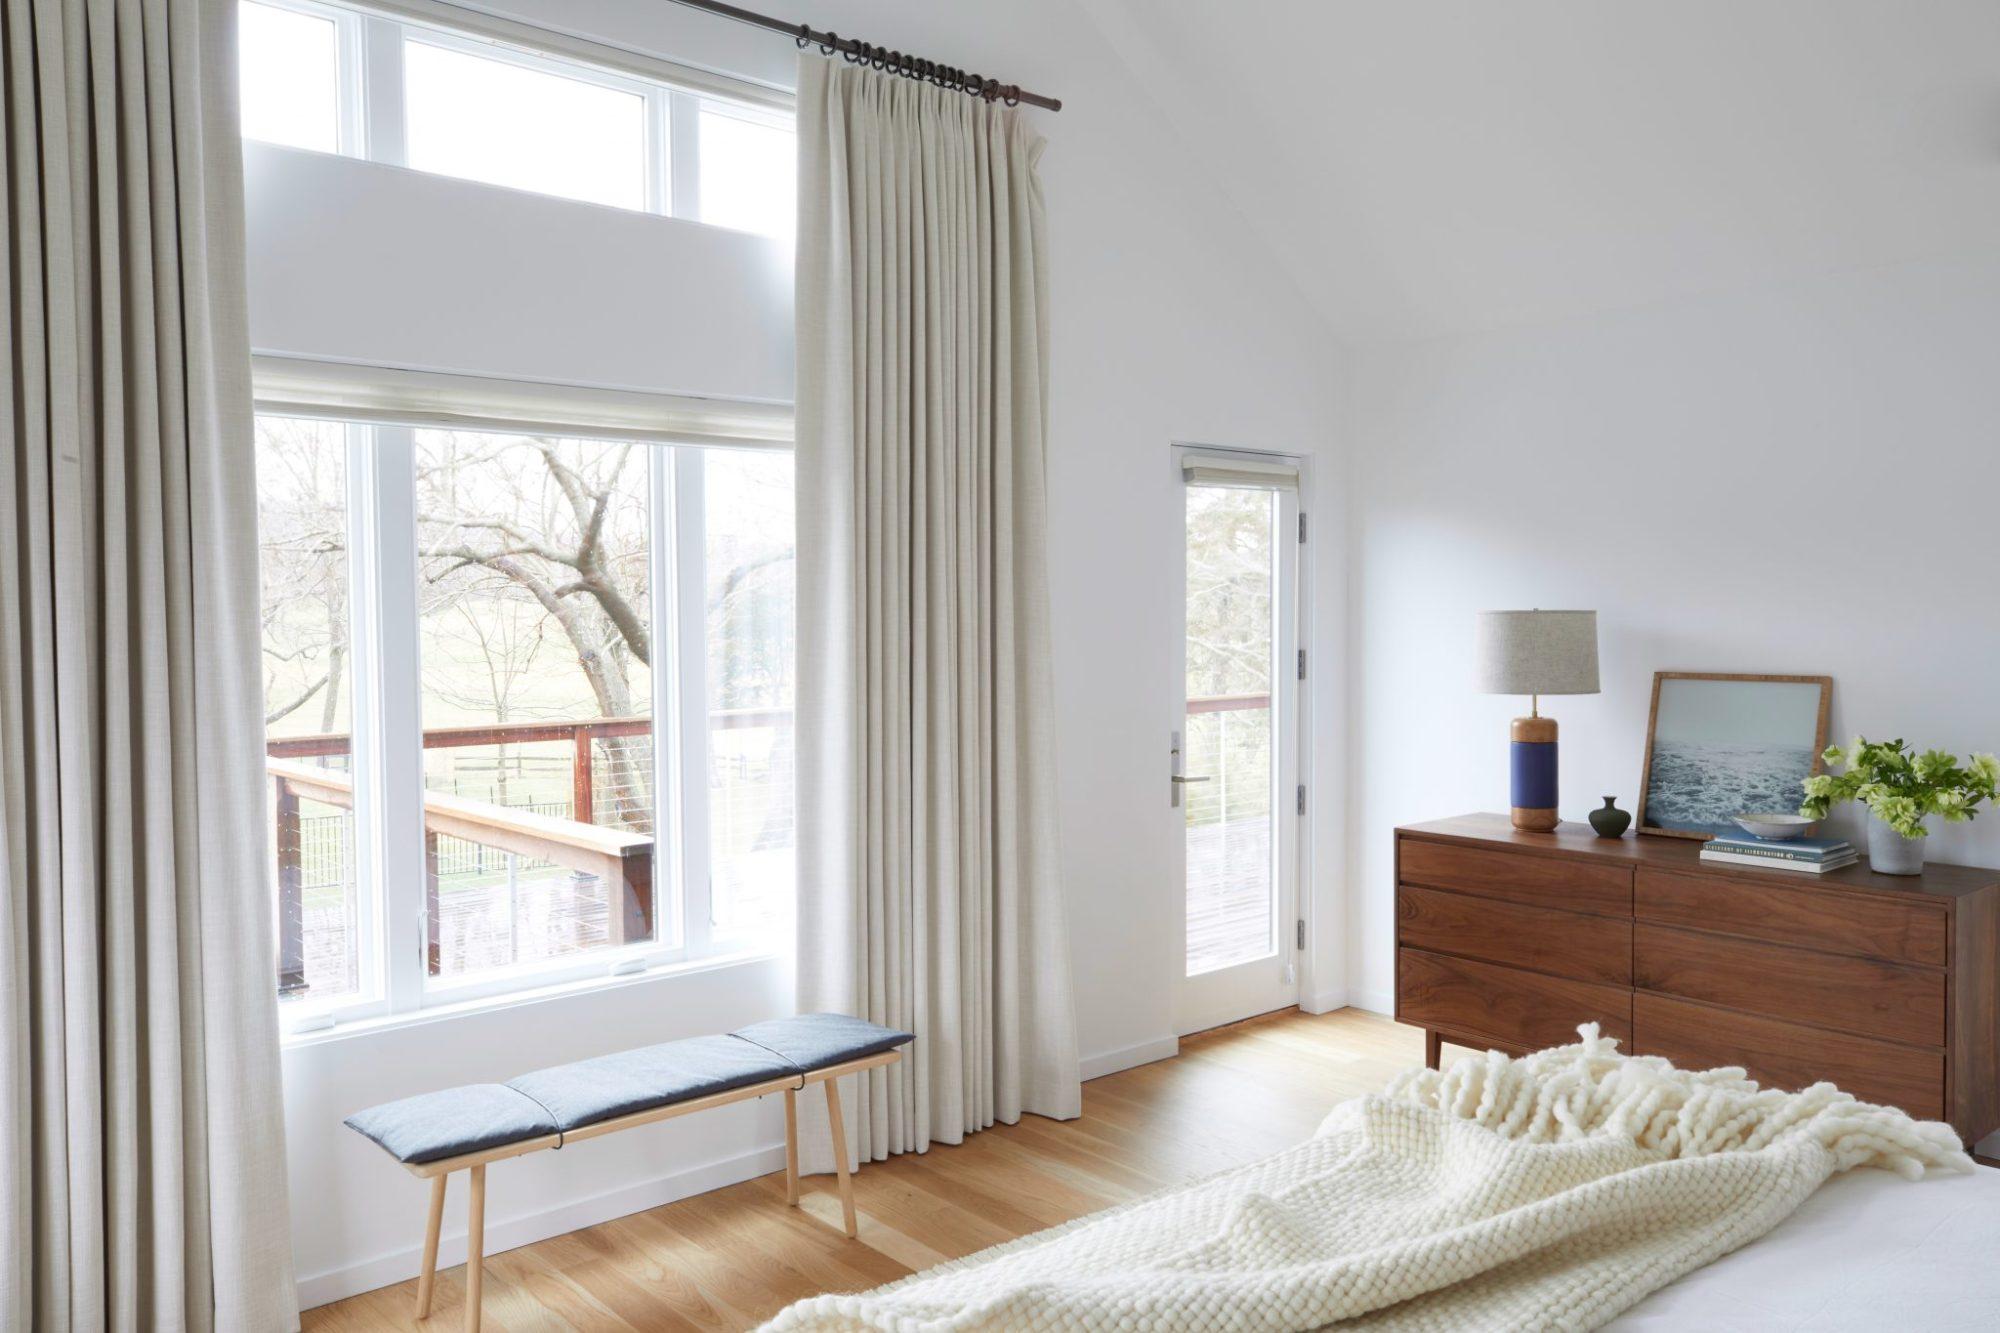 Master Bedroom terrace linen drapery